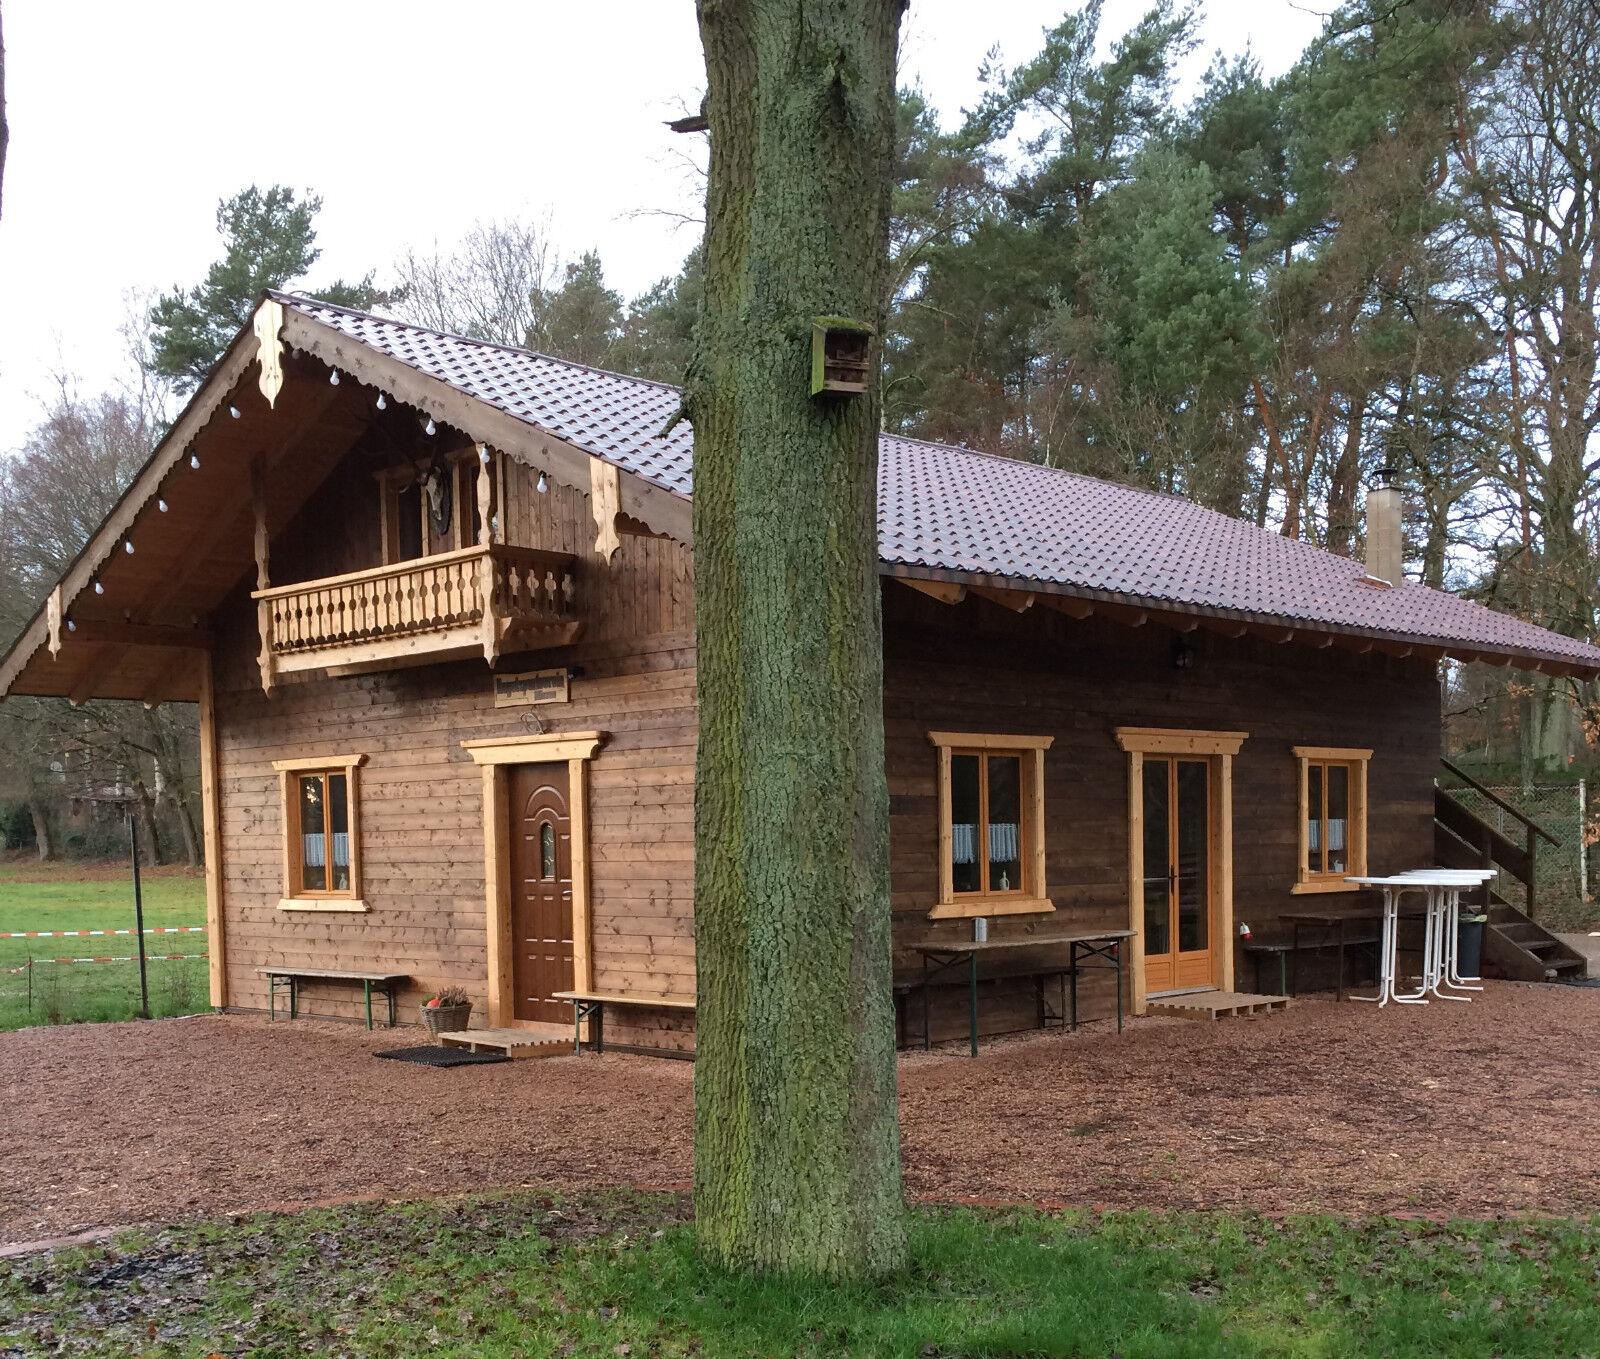 Neues ferienhaus holzhaus blockhaus gartenhaus for Holzhaus blockhaus